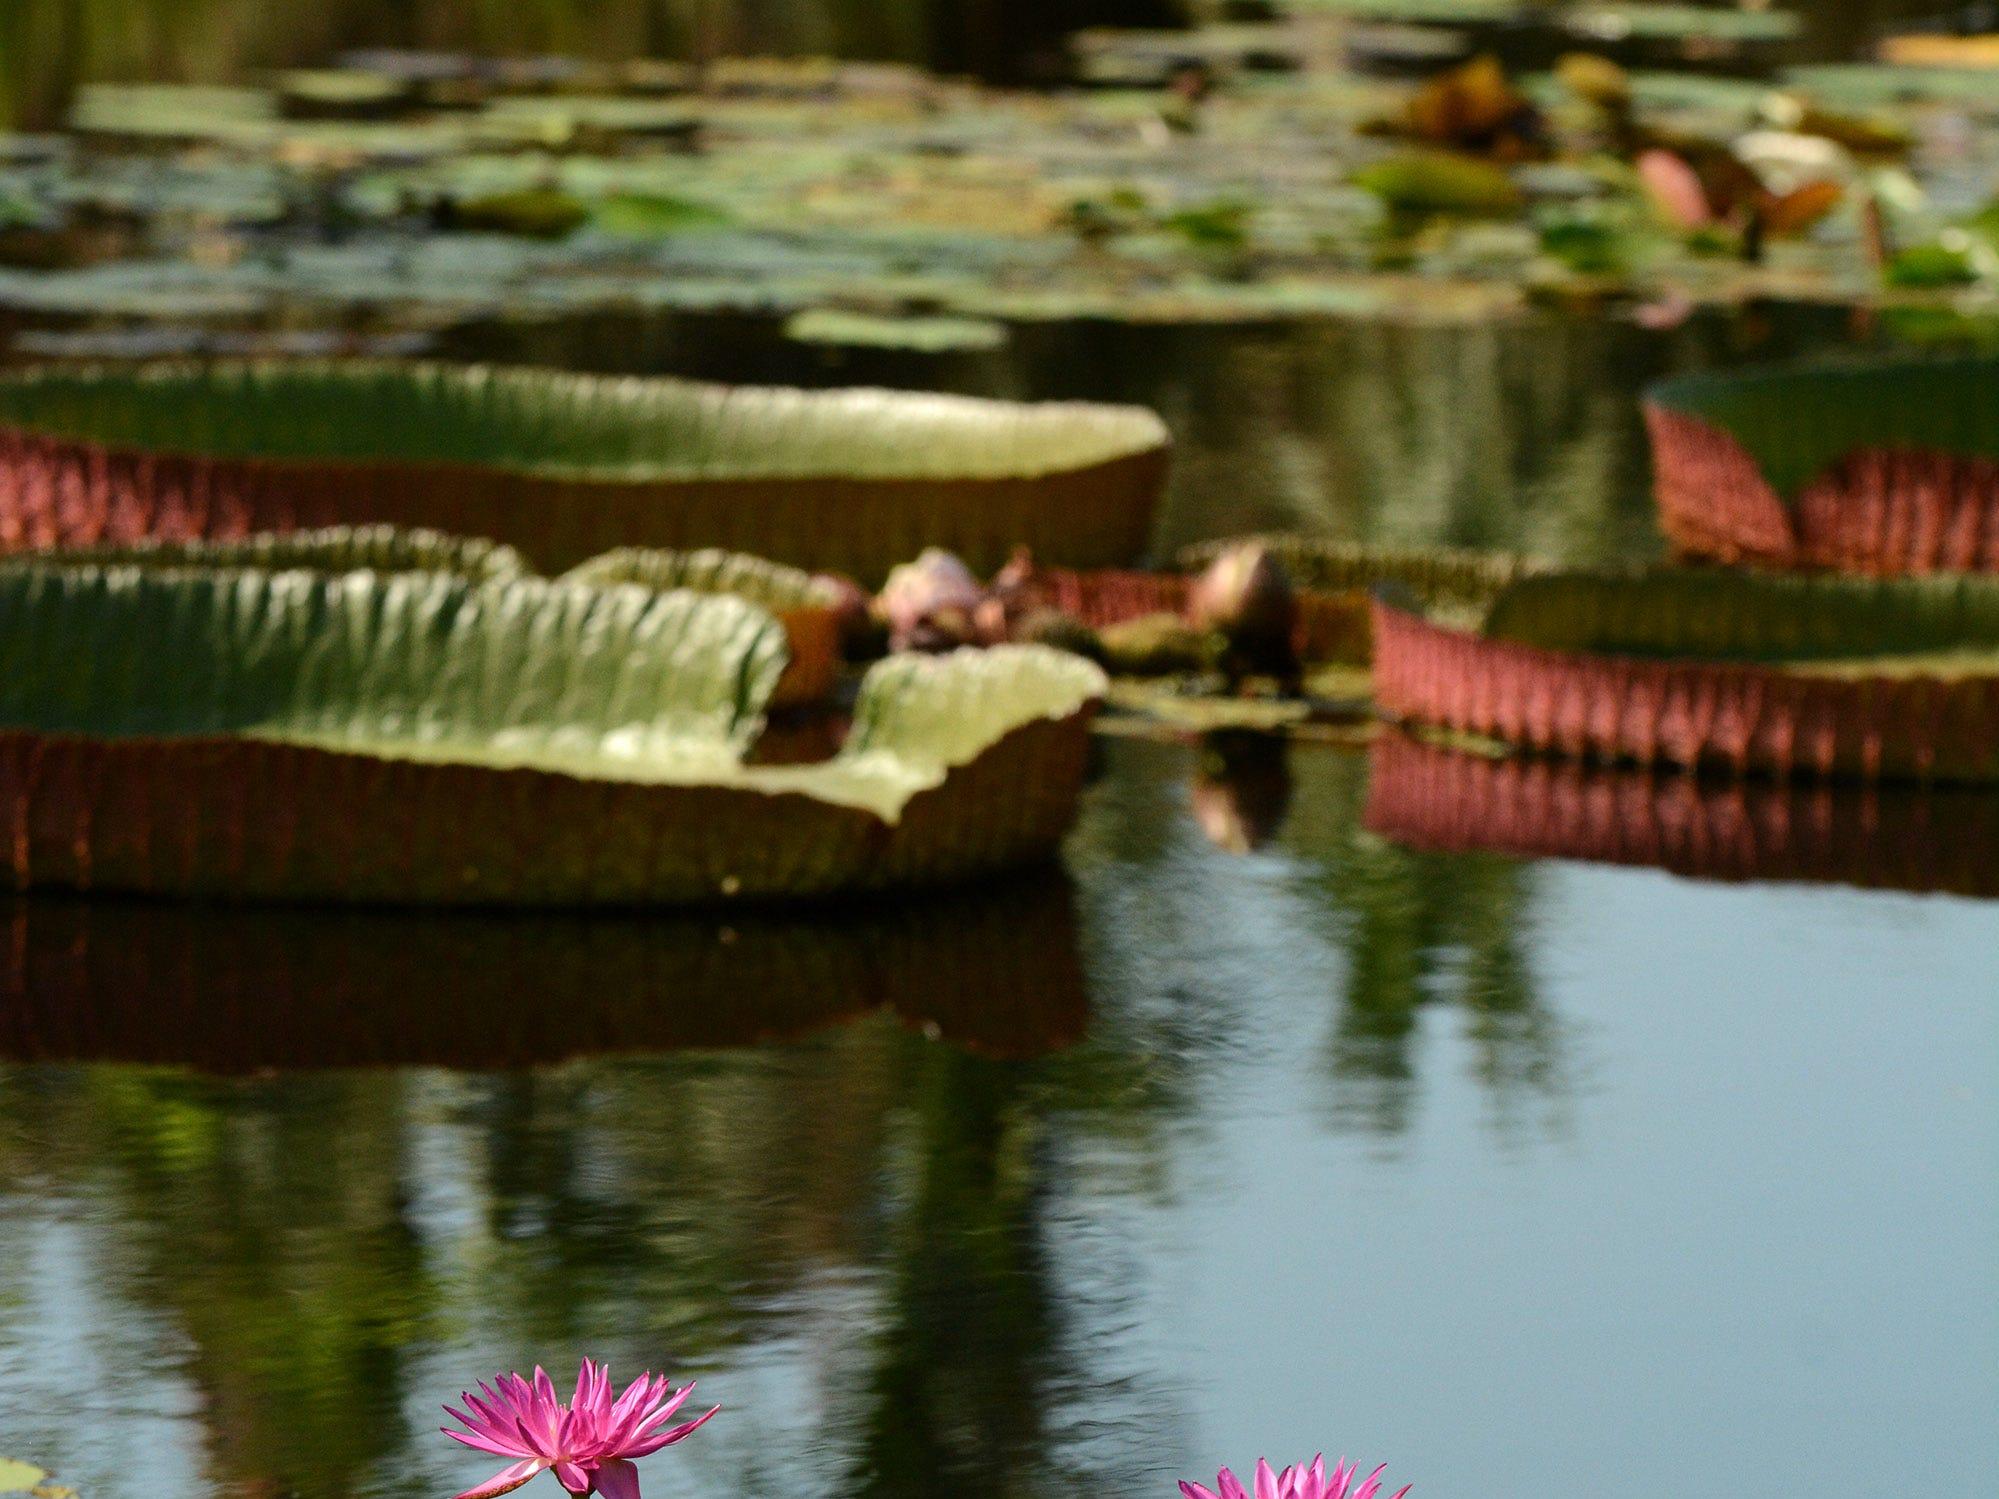 The Naples Botanical Garden contains many beautiful plant specimens.